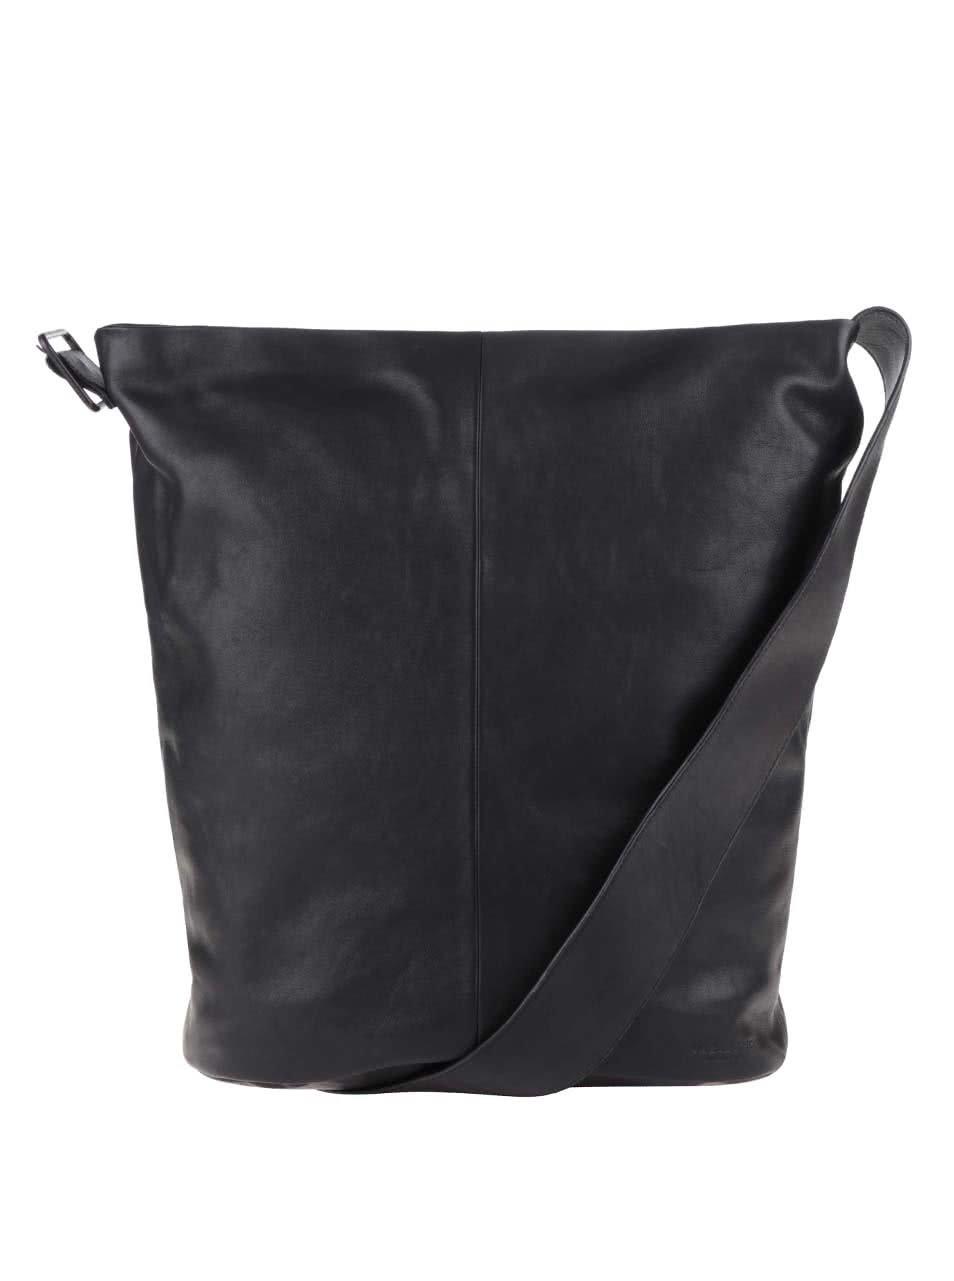 Černá dámská kožená kabelka Vagabond Stockholm